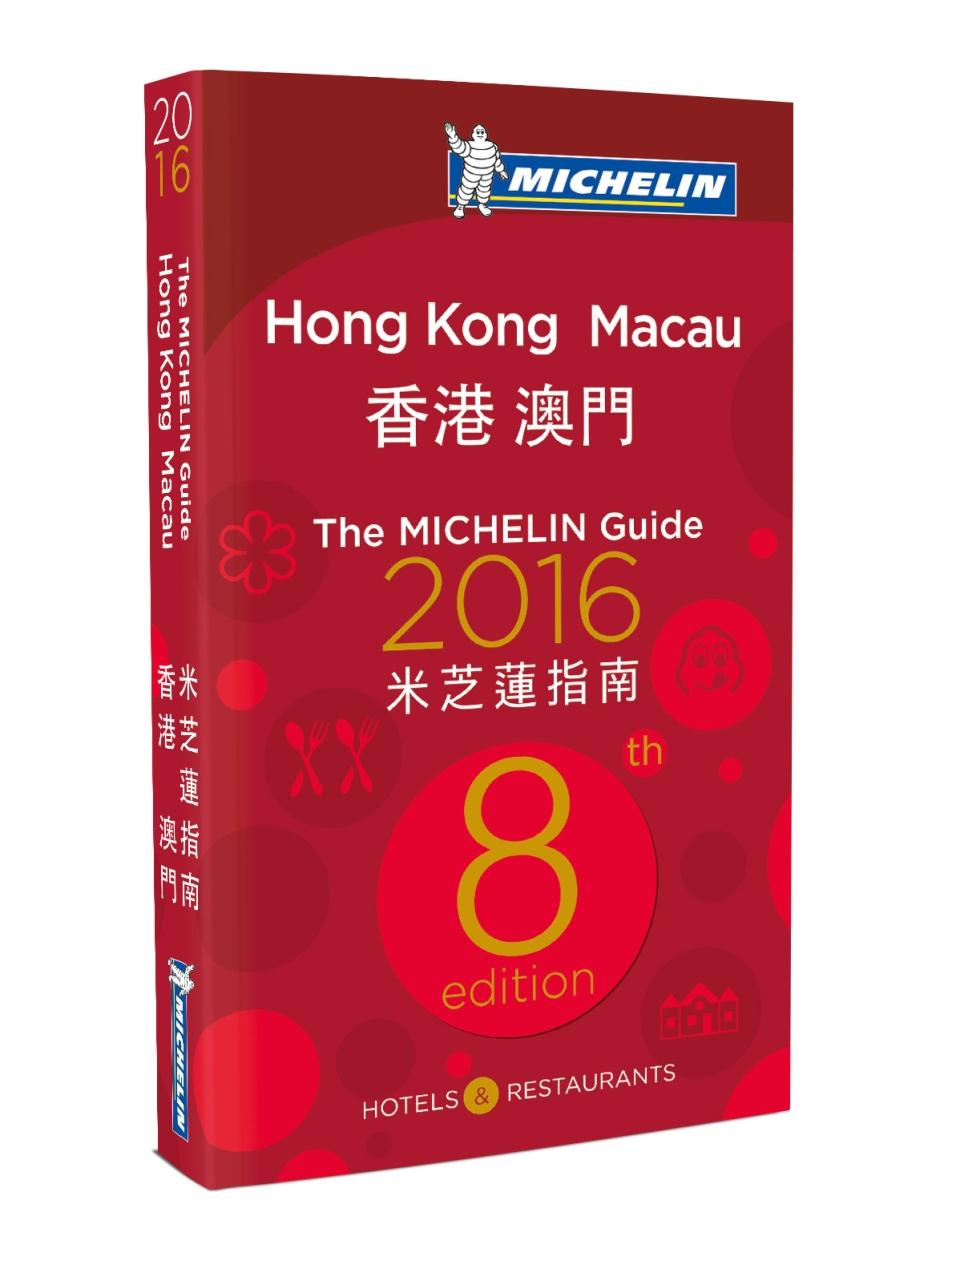 Michelin Guide. Michelin Hong Kong ...